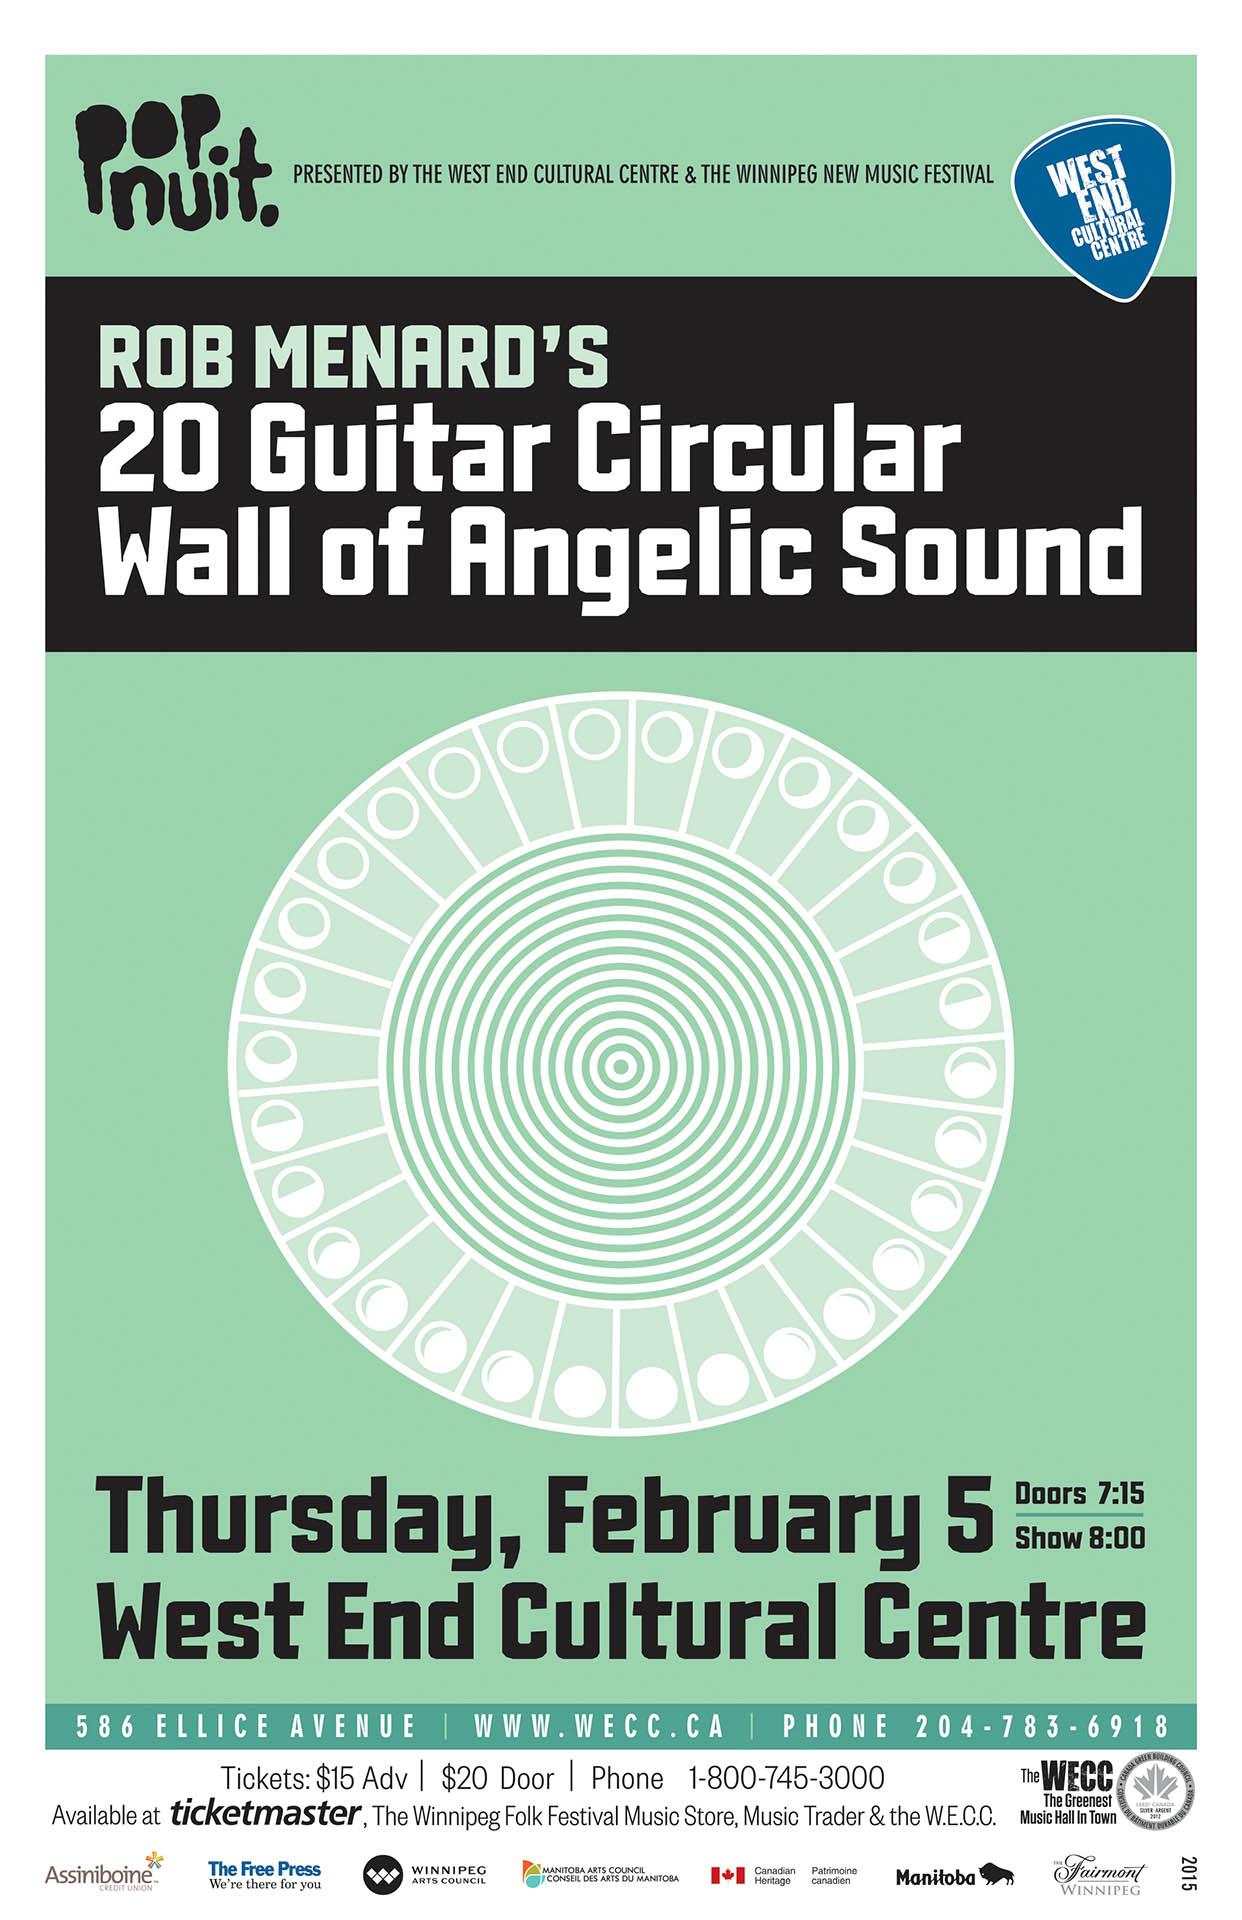 Rob Menard's 20 Guitar Circular Wall of Angelic Sound - 2015